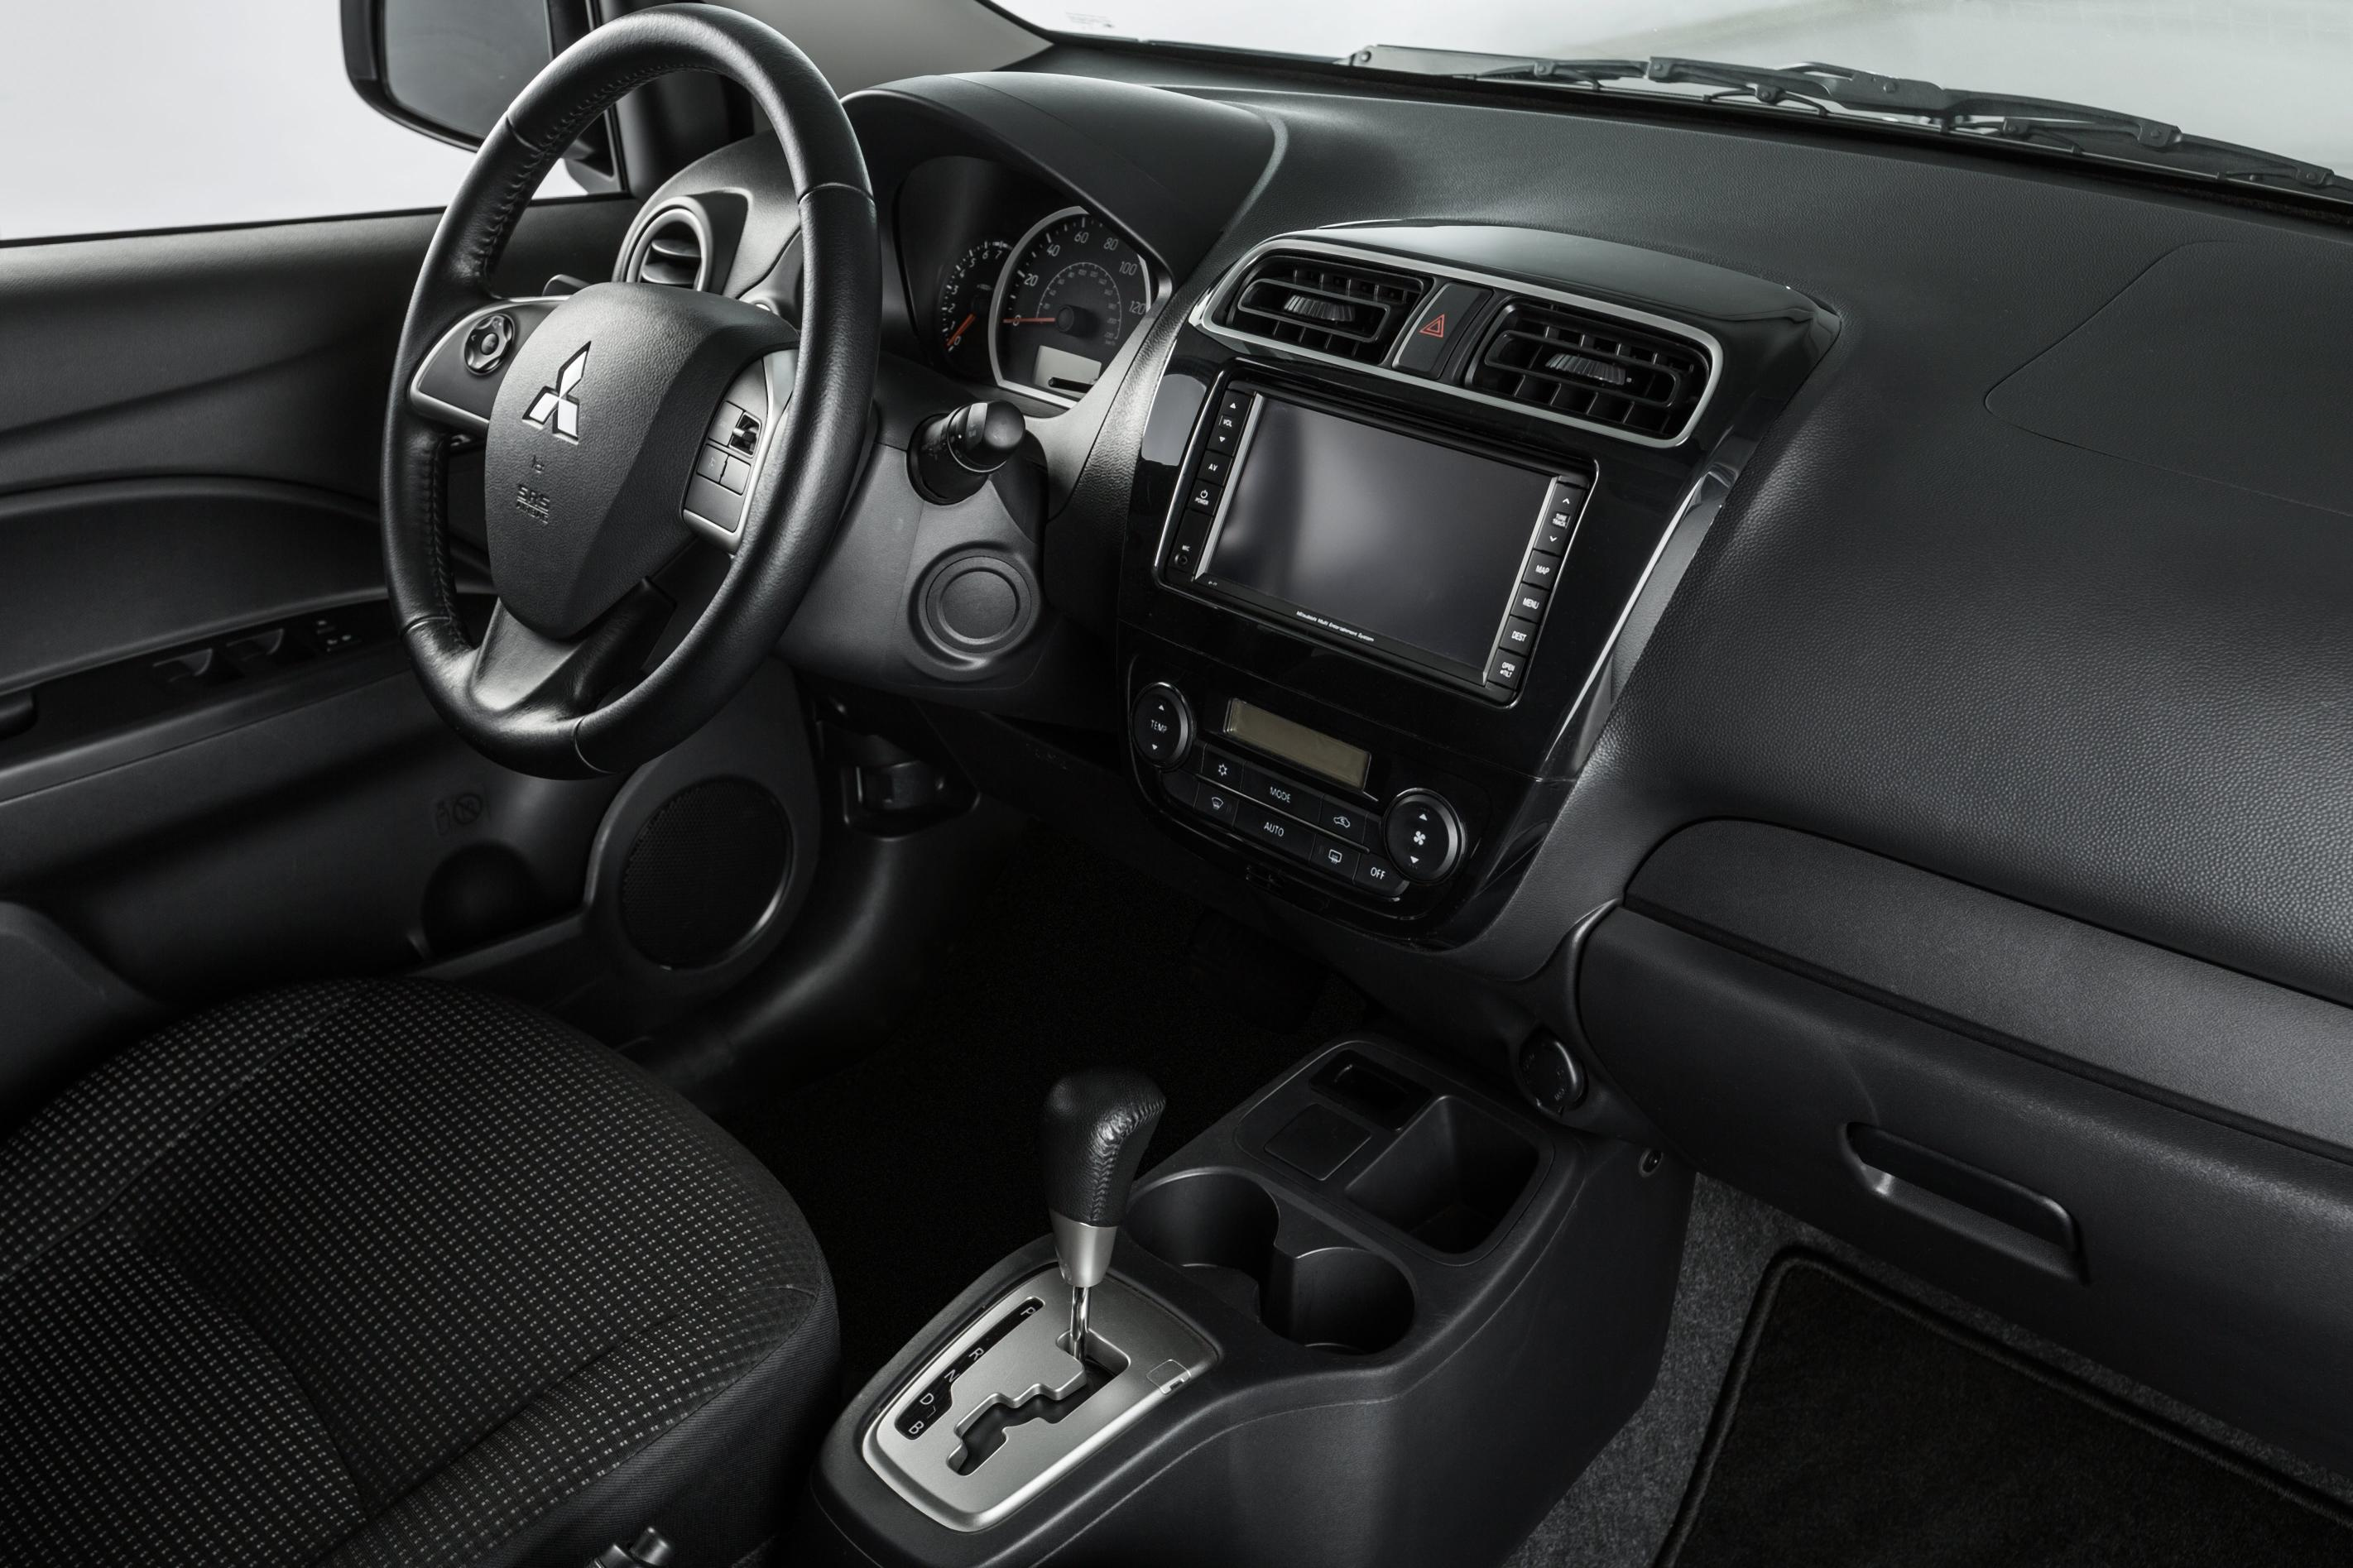 2015 Mitsubishi Mirage Interior